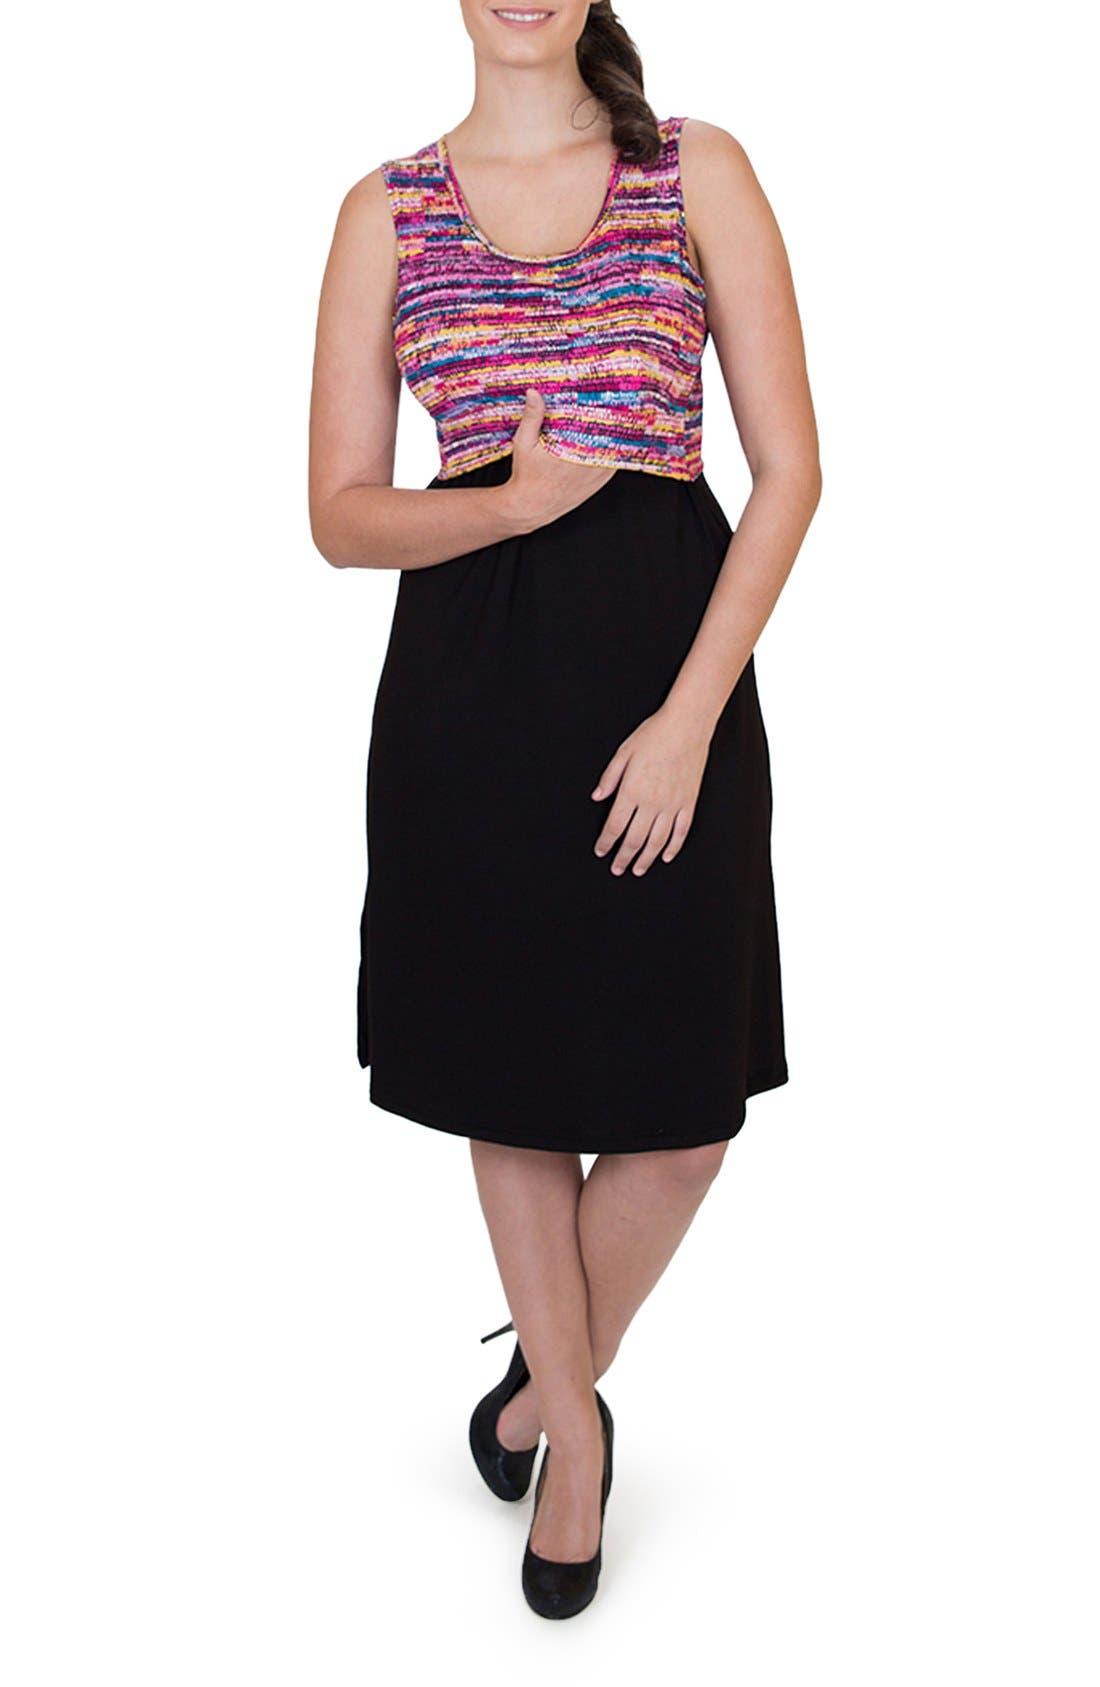 'Ana' Maternity/Nursing Dress,                             Alternate thumbnail 4, color,                             Colorful Top W/ Black Skirt